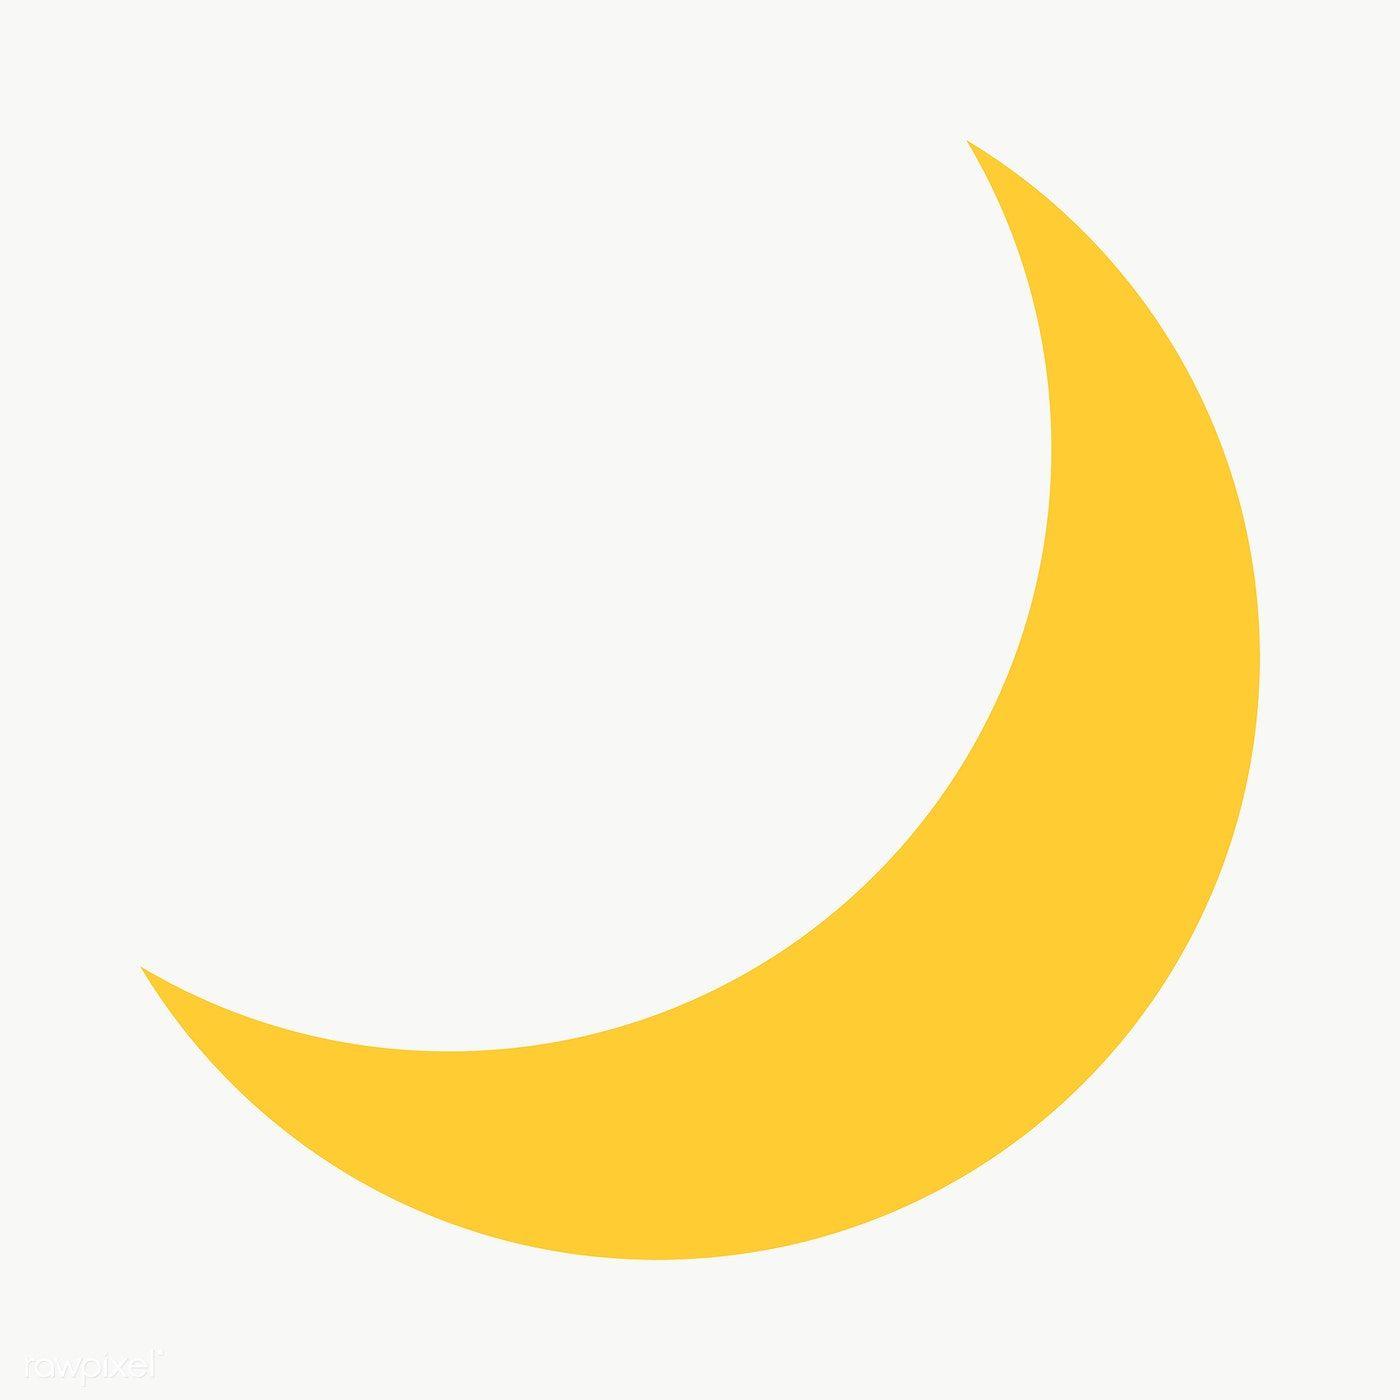 Yellow Crescent Geometric Shape Transparent Png Free Image By Rawpixel Com Ningzk V Sekolah